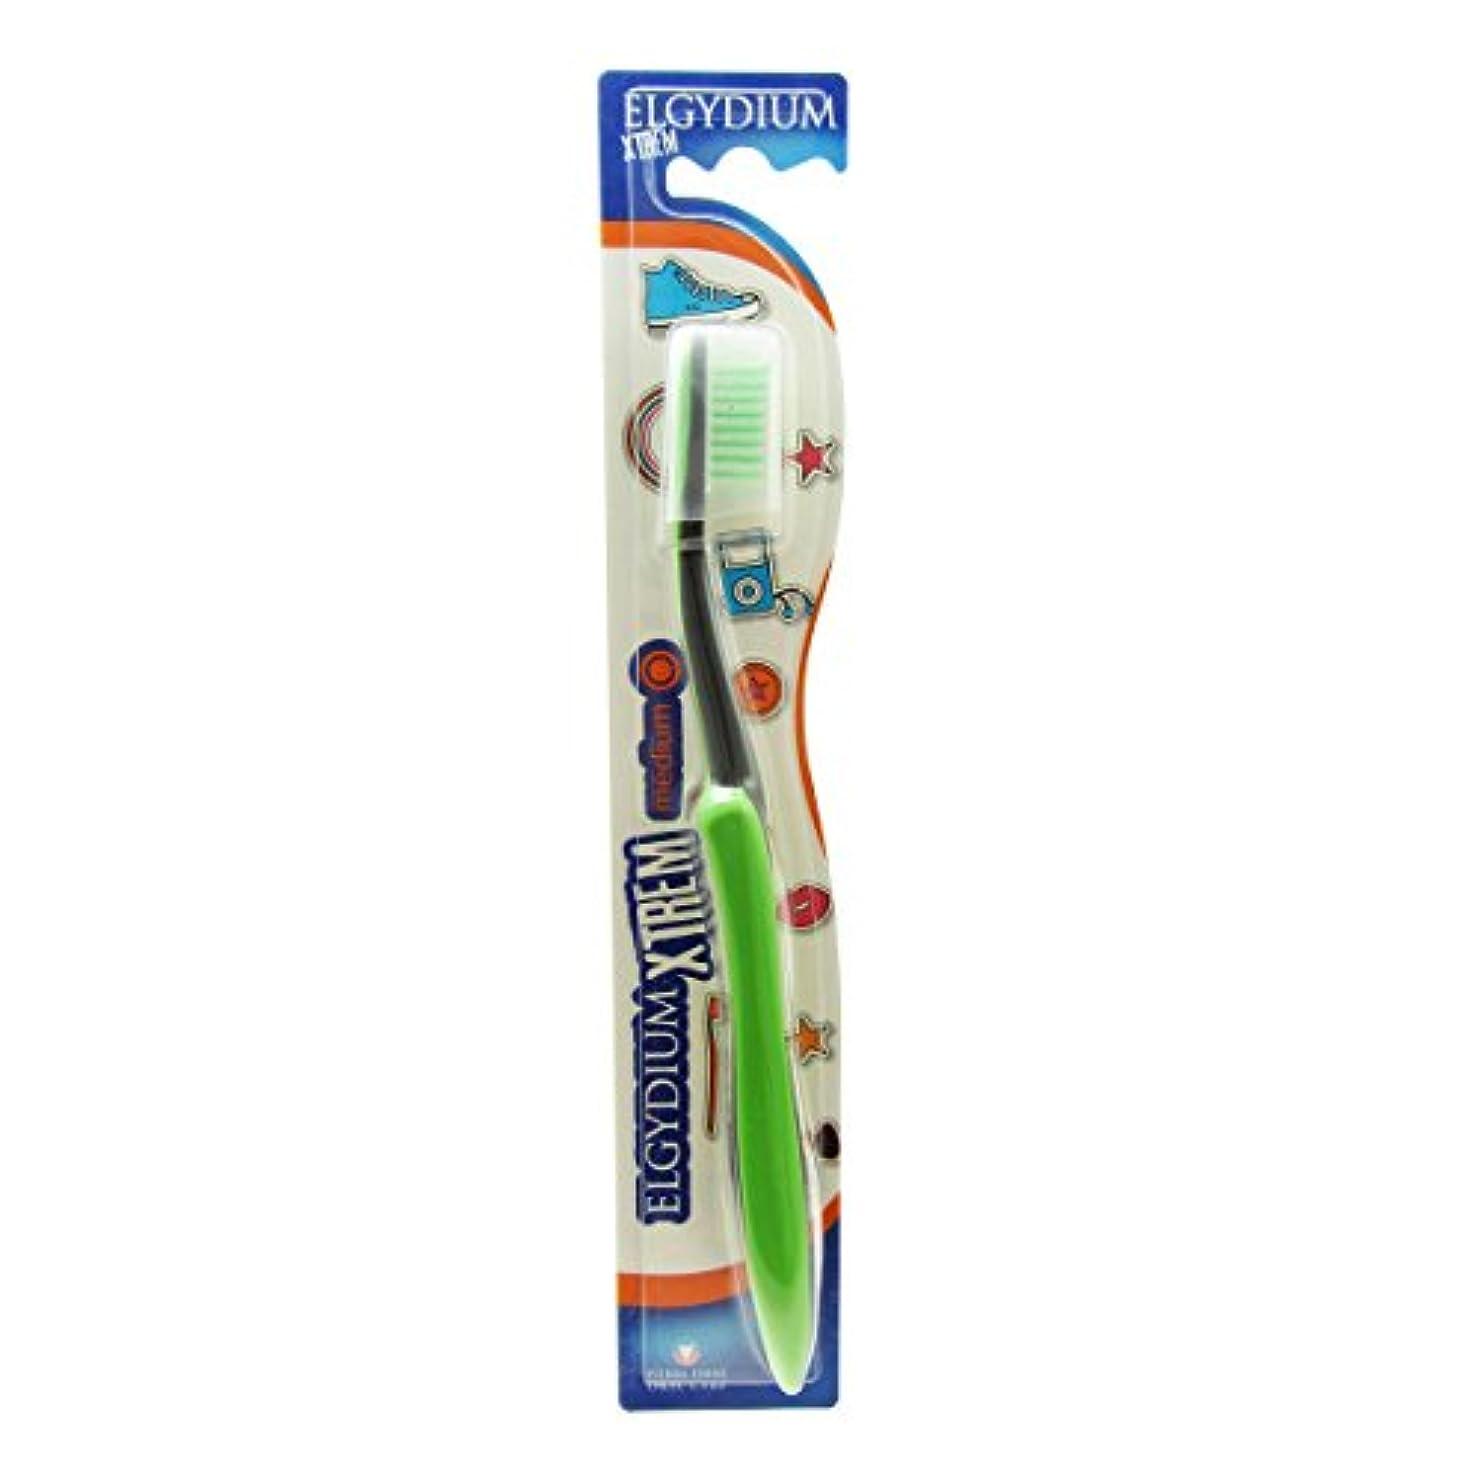 賛美歌土精神Elgydium Xtrem Toothbrush Medium Hardness [並行輸入品]